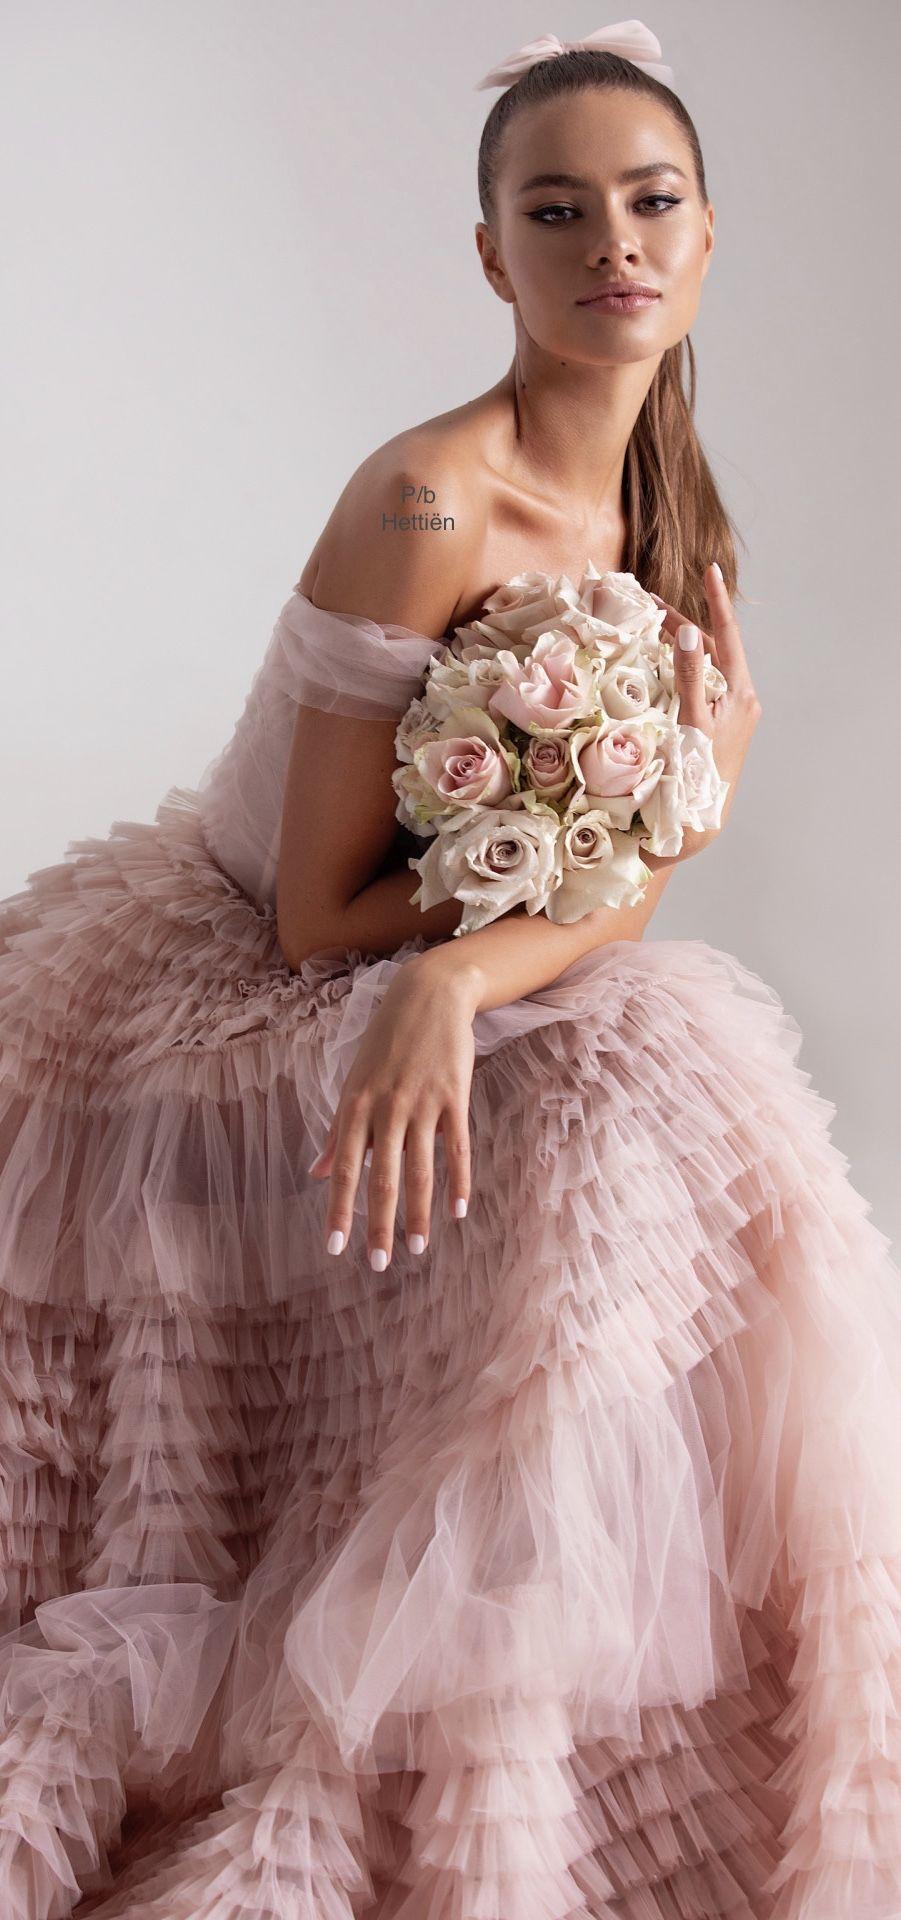 Milla Nova Gown by Lorenzo Rossi in 2020 Wedding dresses